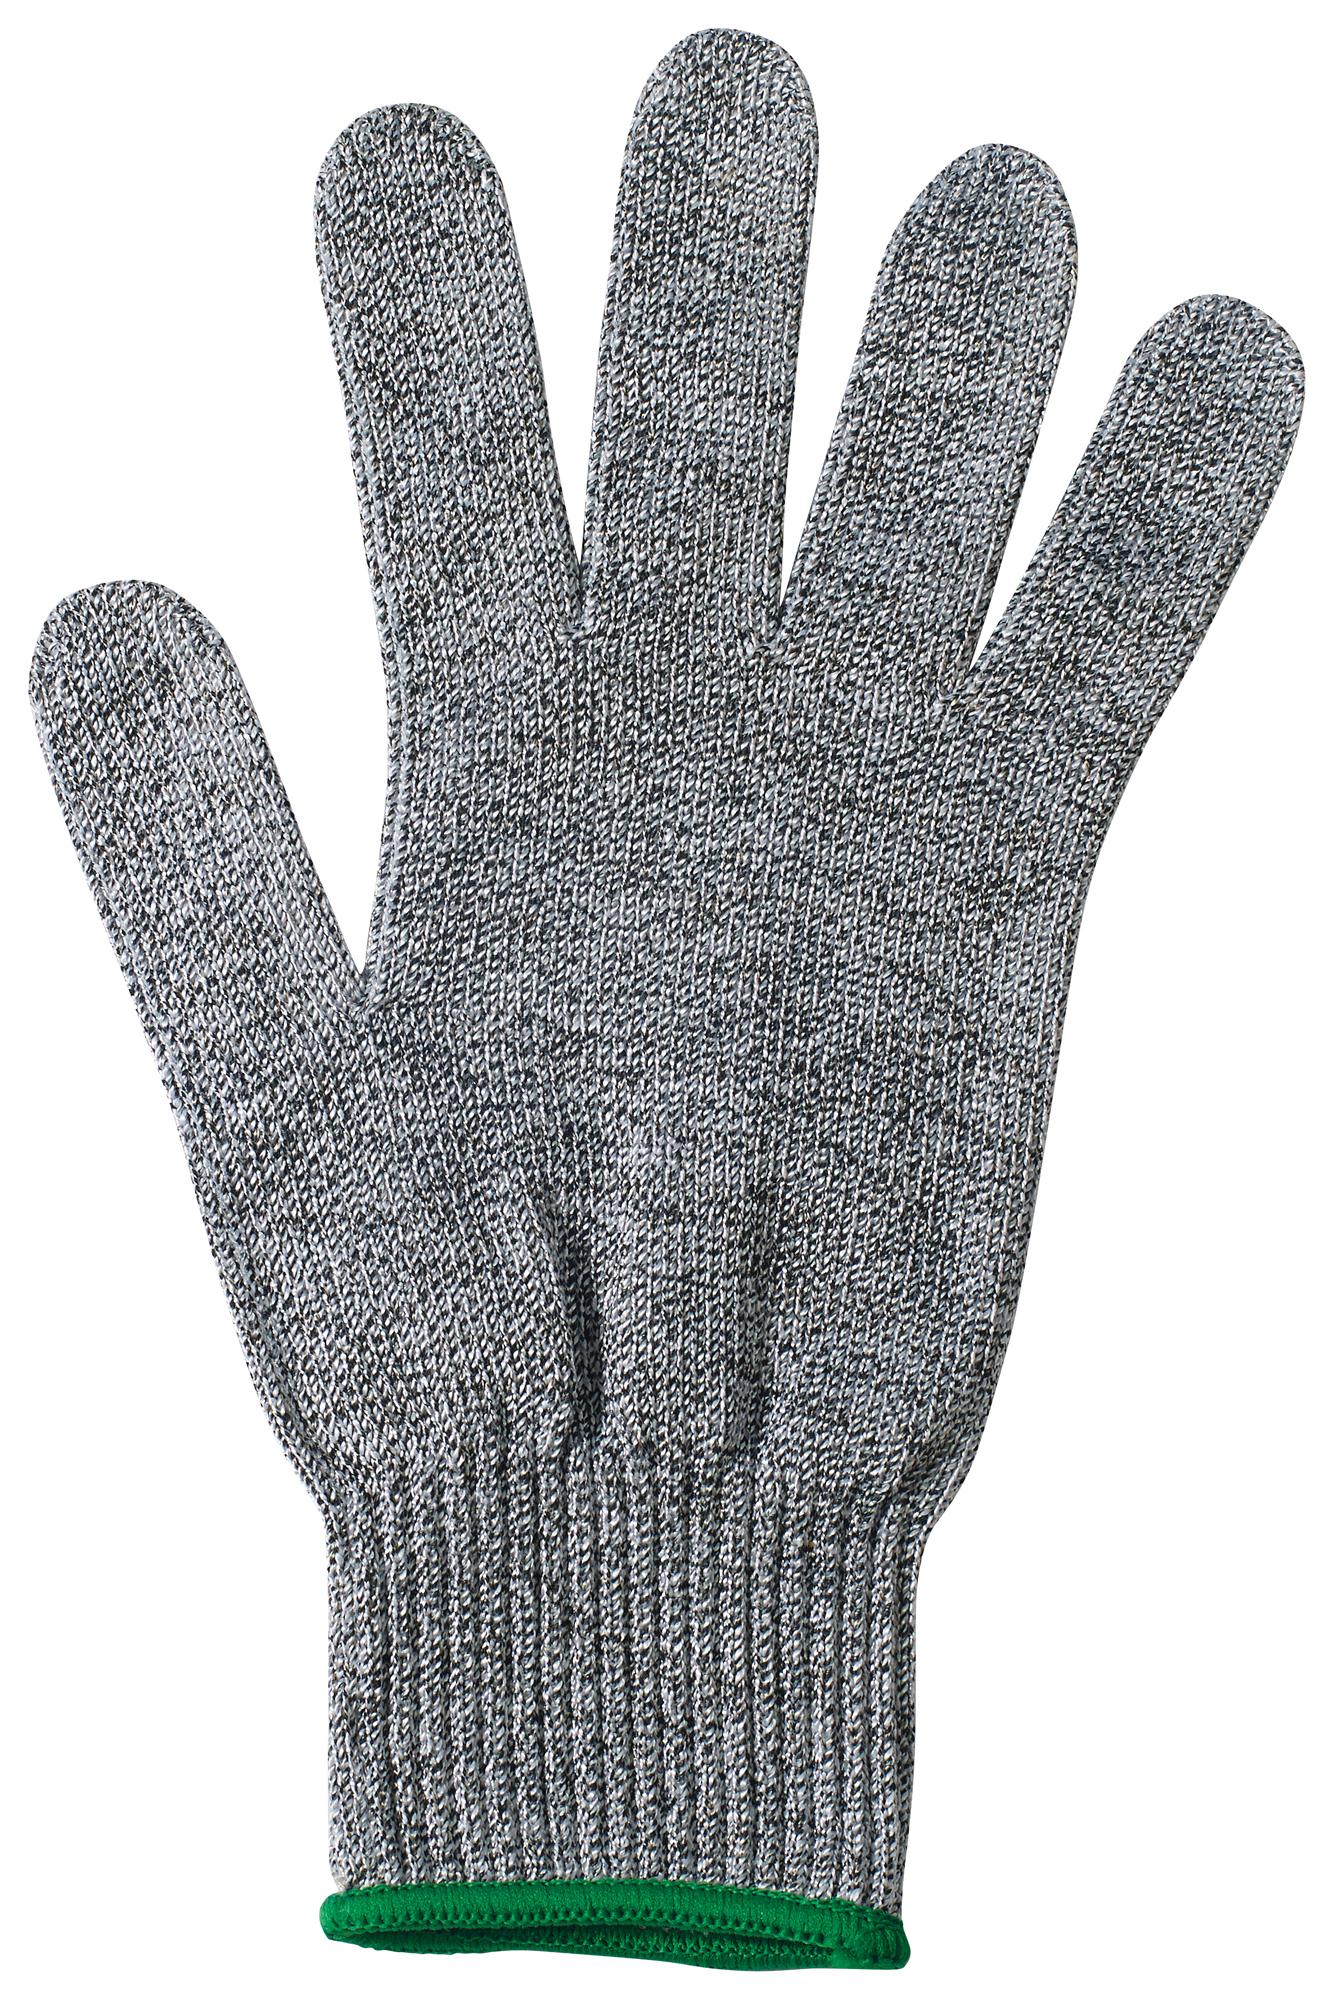 Winco GCRA-M resistant glove